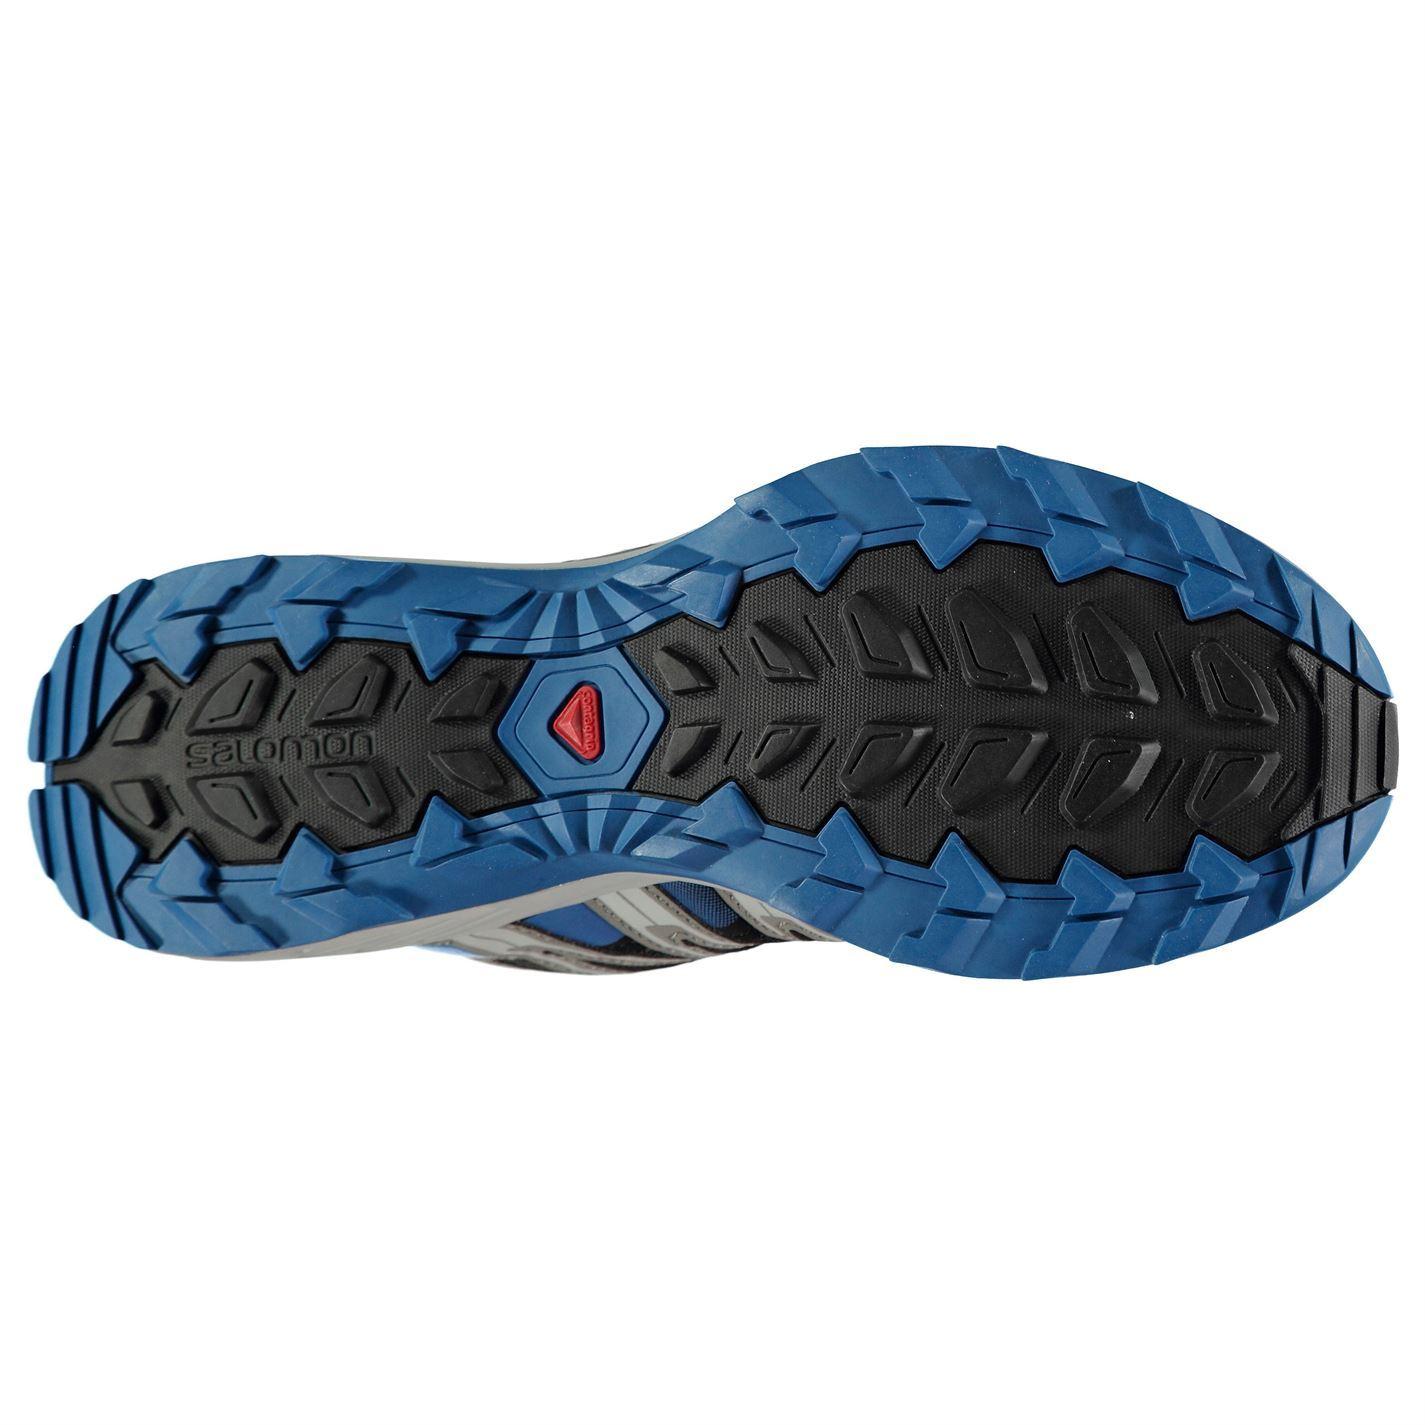 Detalles de Salomon Xa Lite Trail Running Zapatos Hombre Negro Fitness Trote Zapatillas